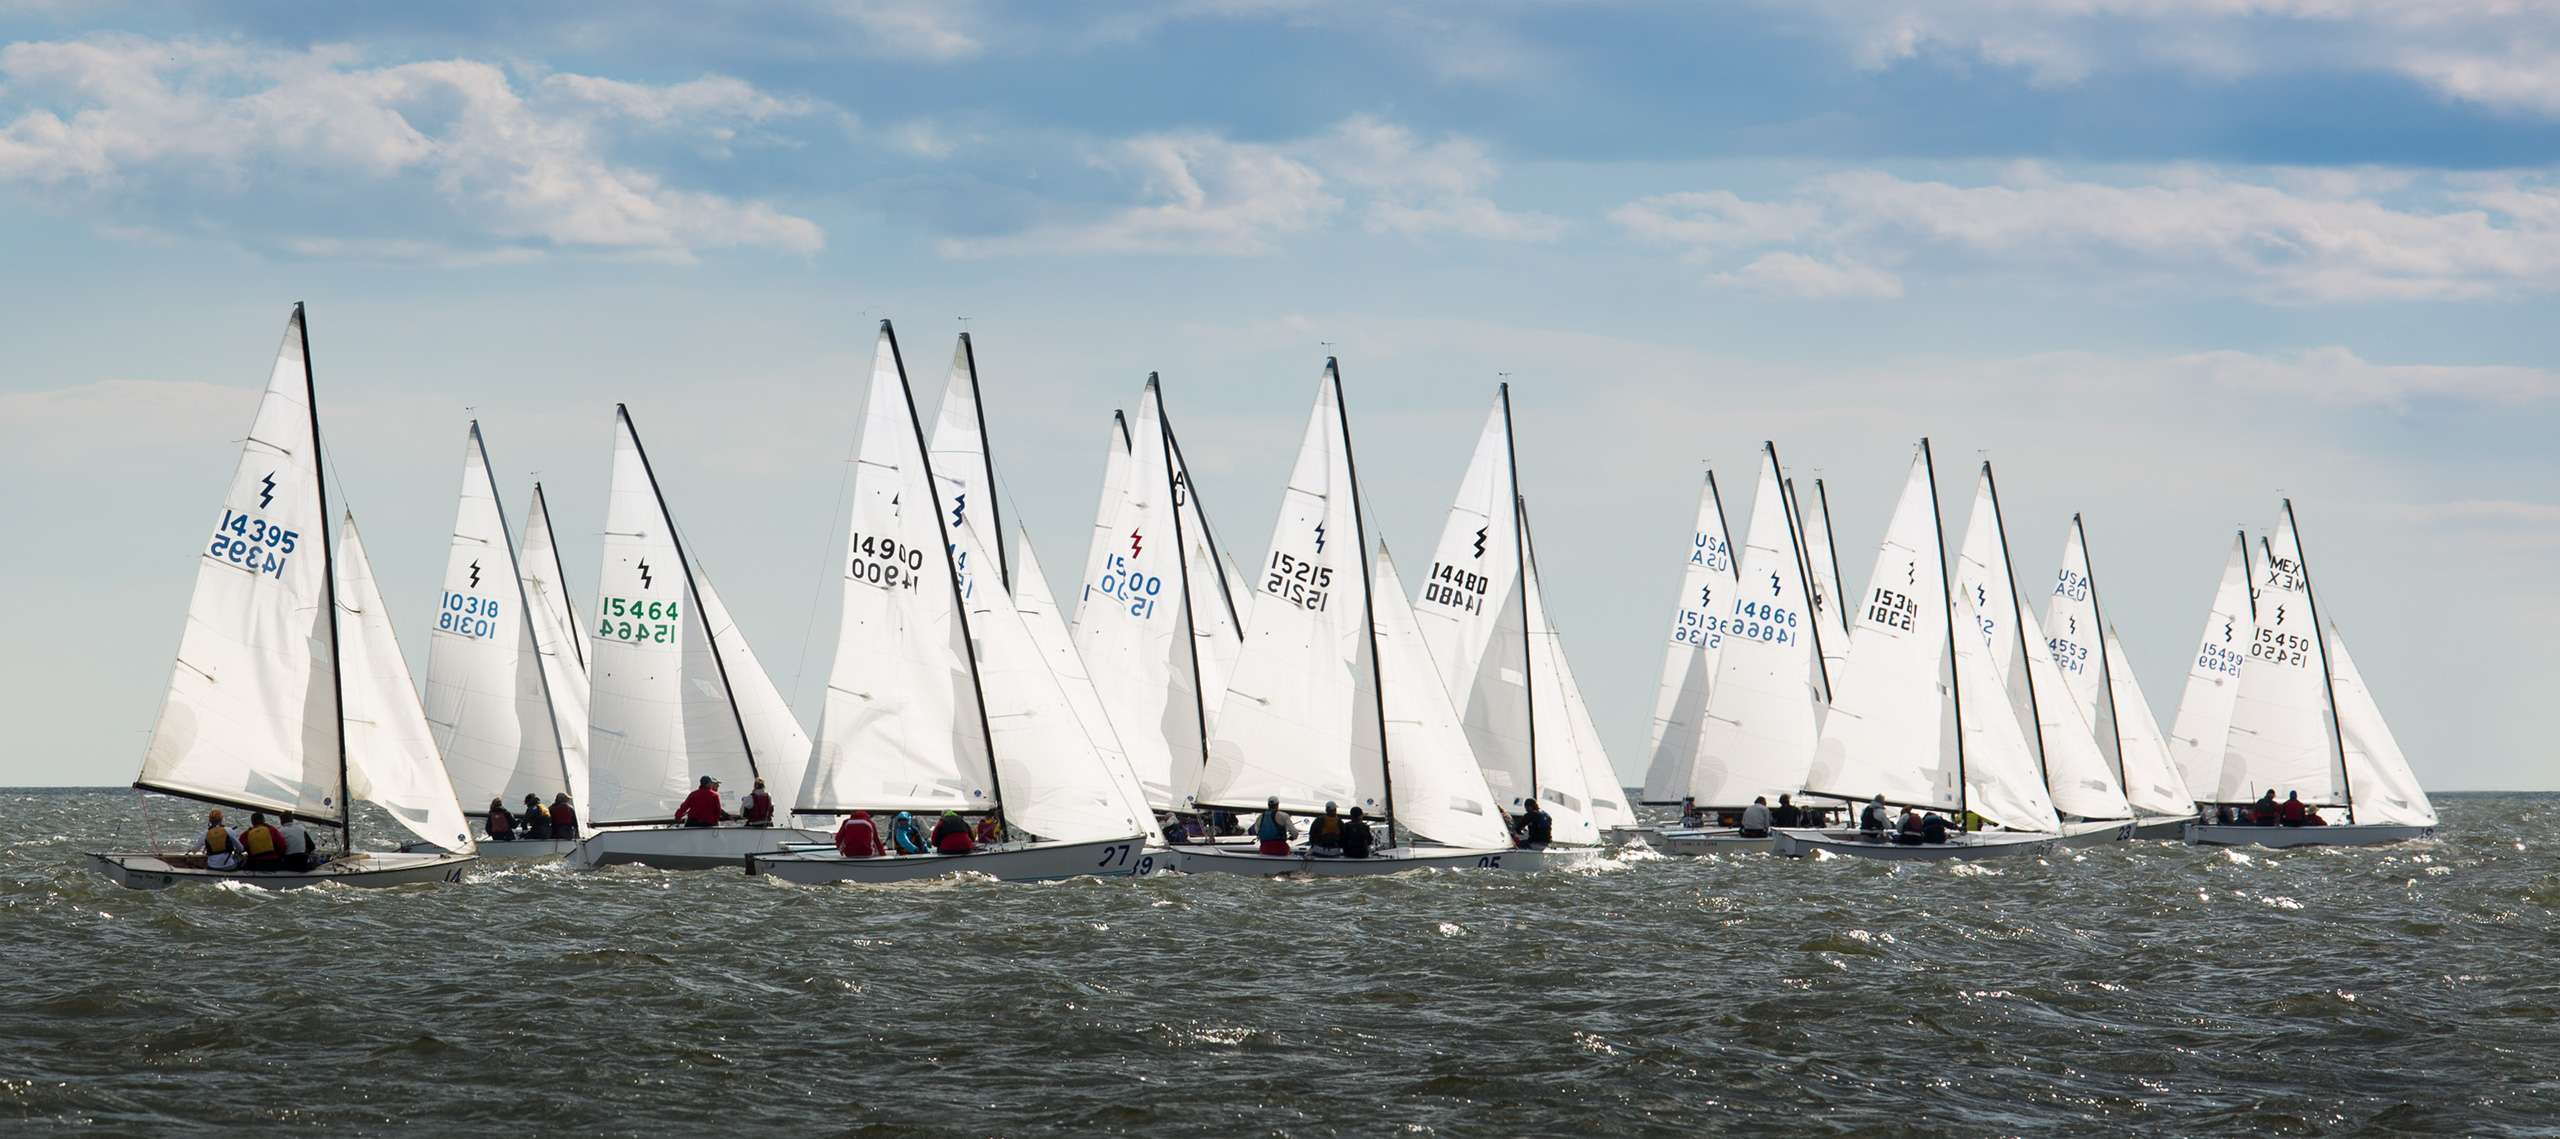 PORTFOLIO - Sailing - Chesapeake #1 PCG747